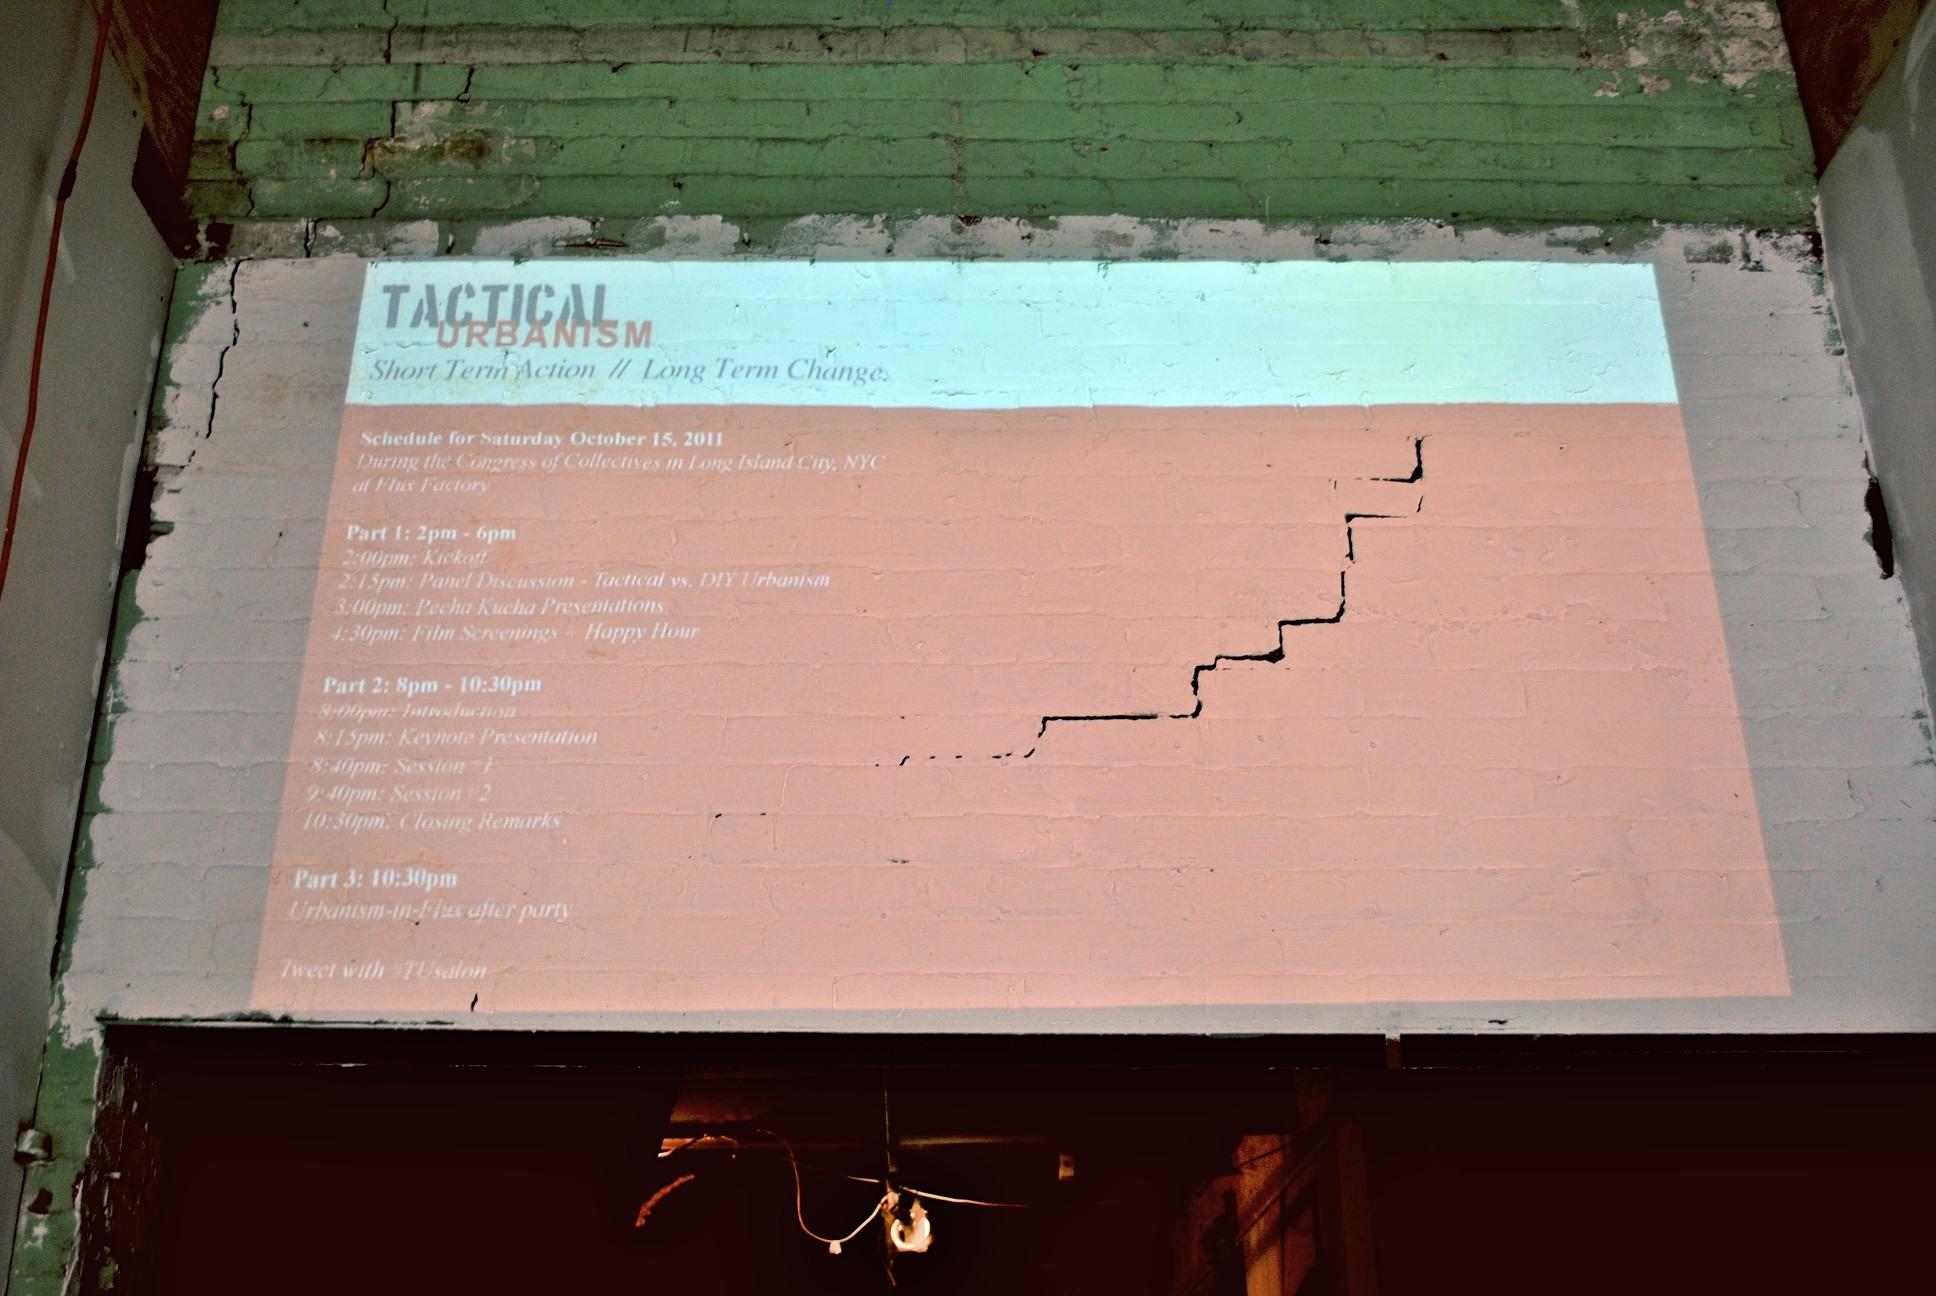 DoTank:Brooklyn, Street Plans, and Tomorrow Lab host an international forum on Tactical Urbanism